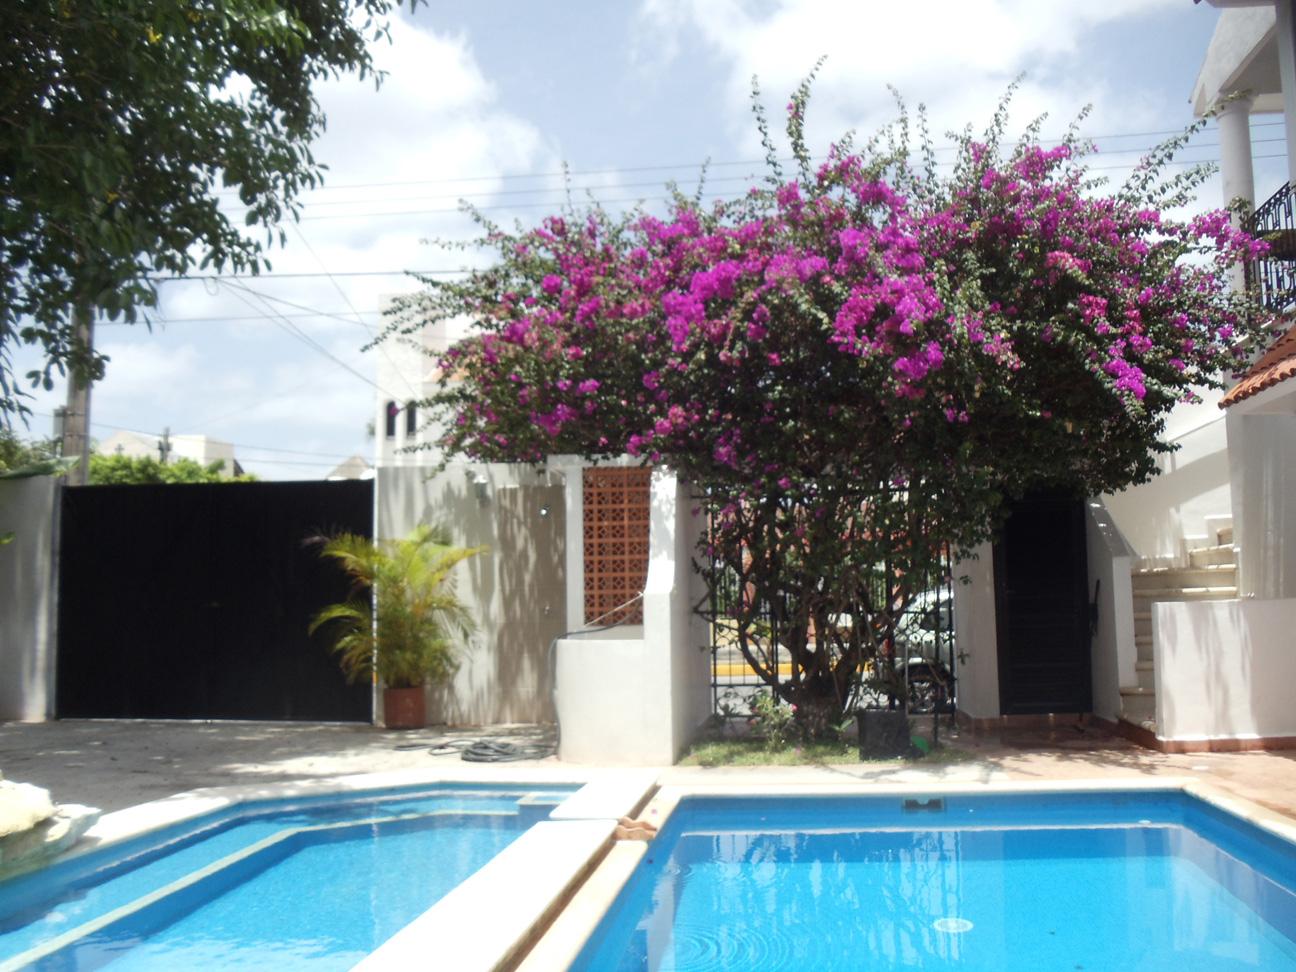 Cozumel reviews of vacation rental Casa Topaz